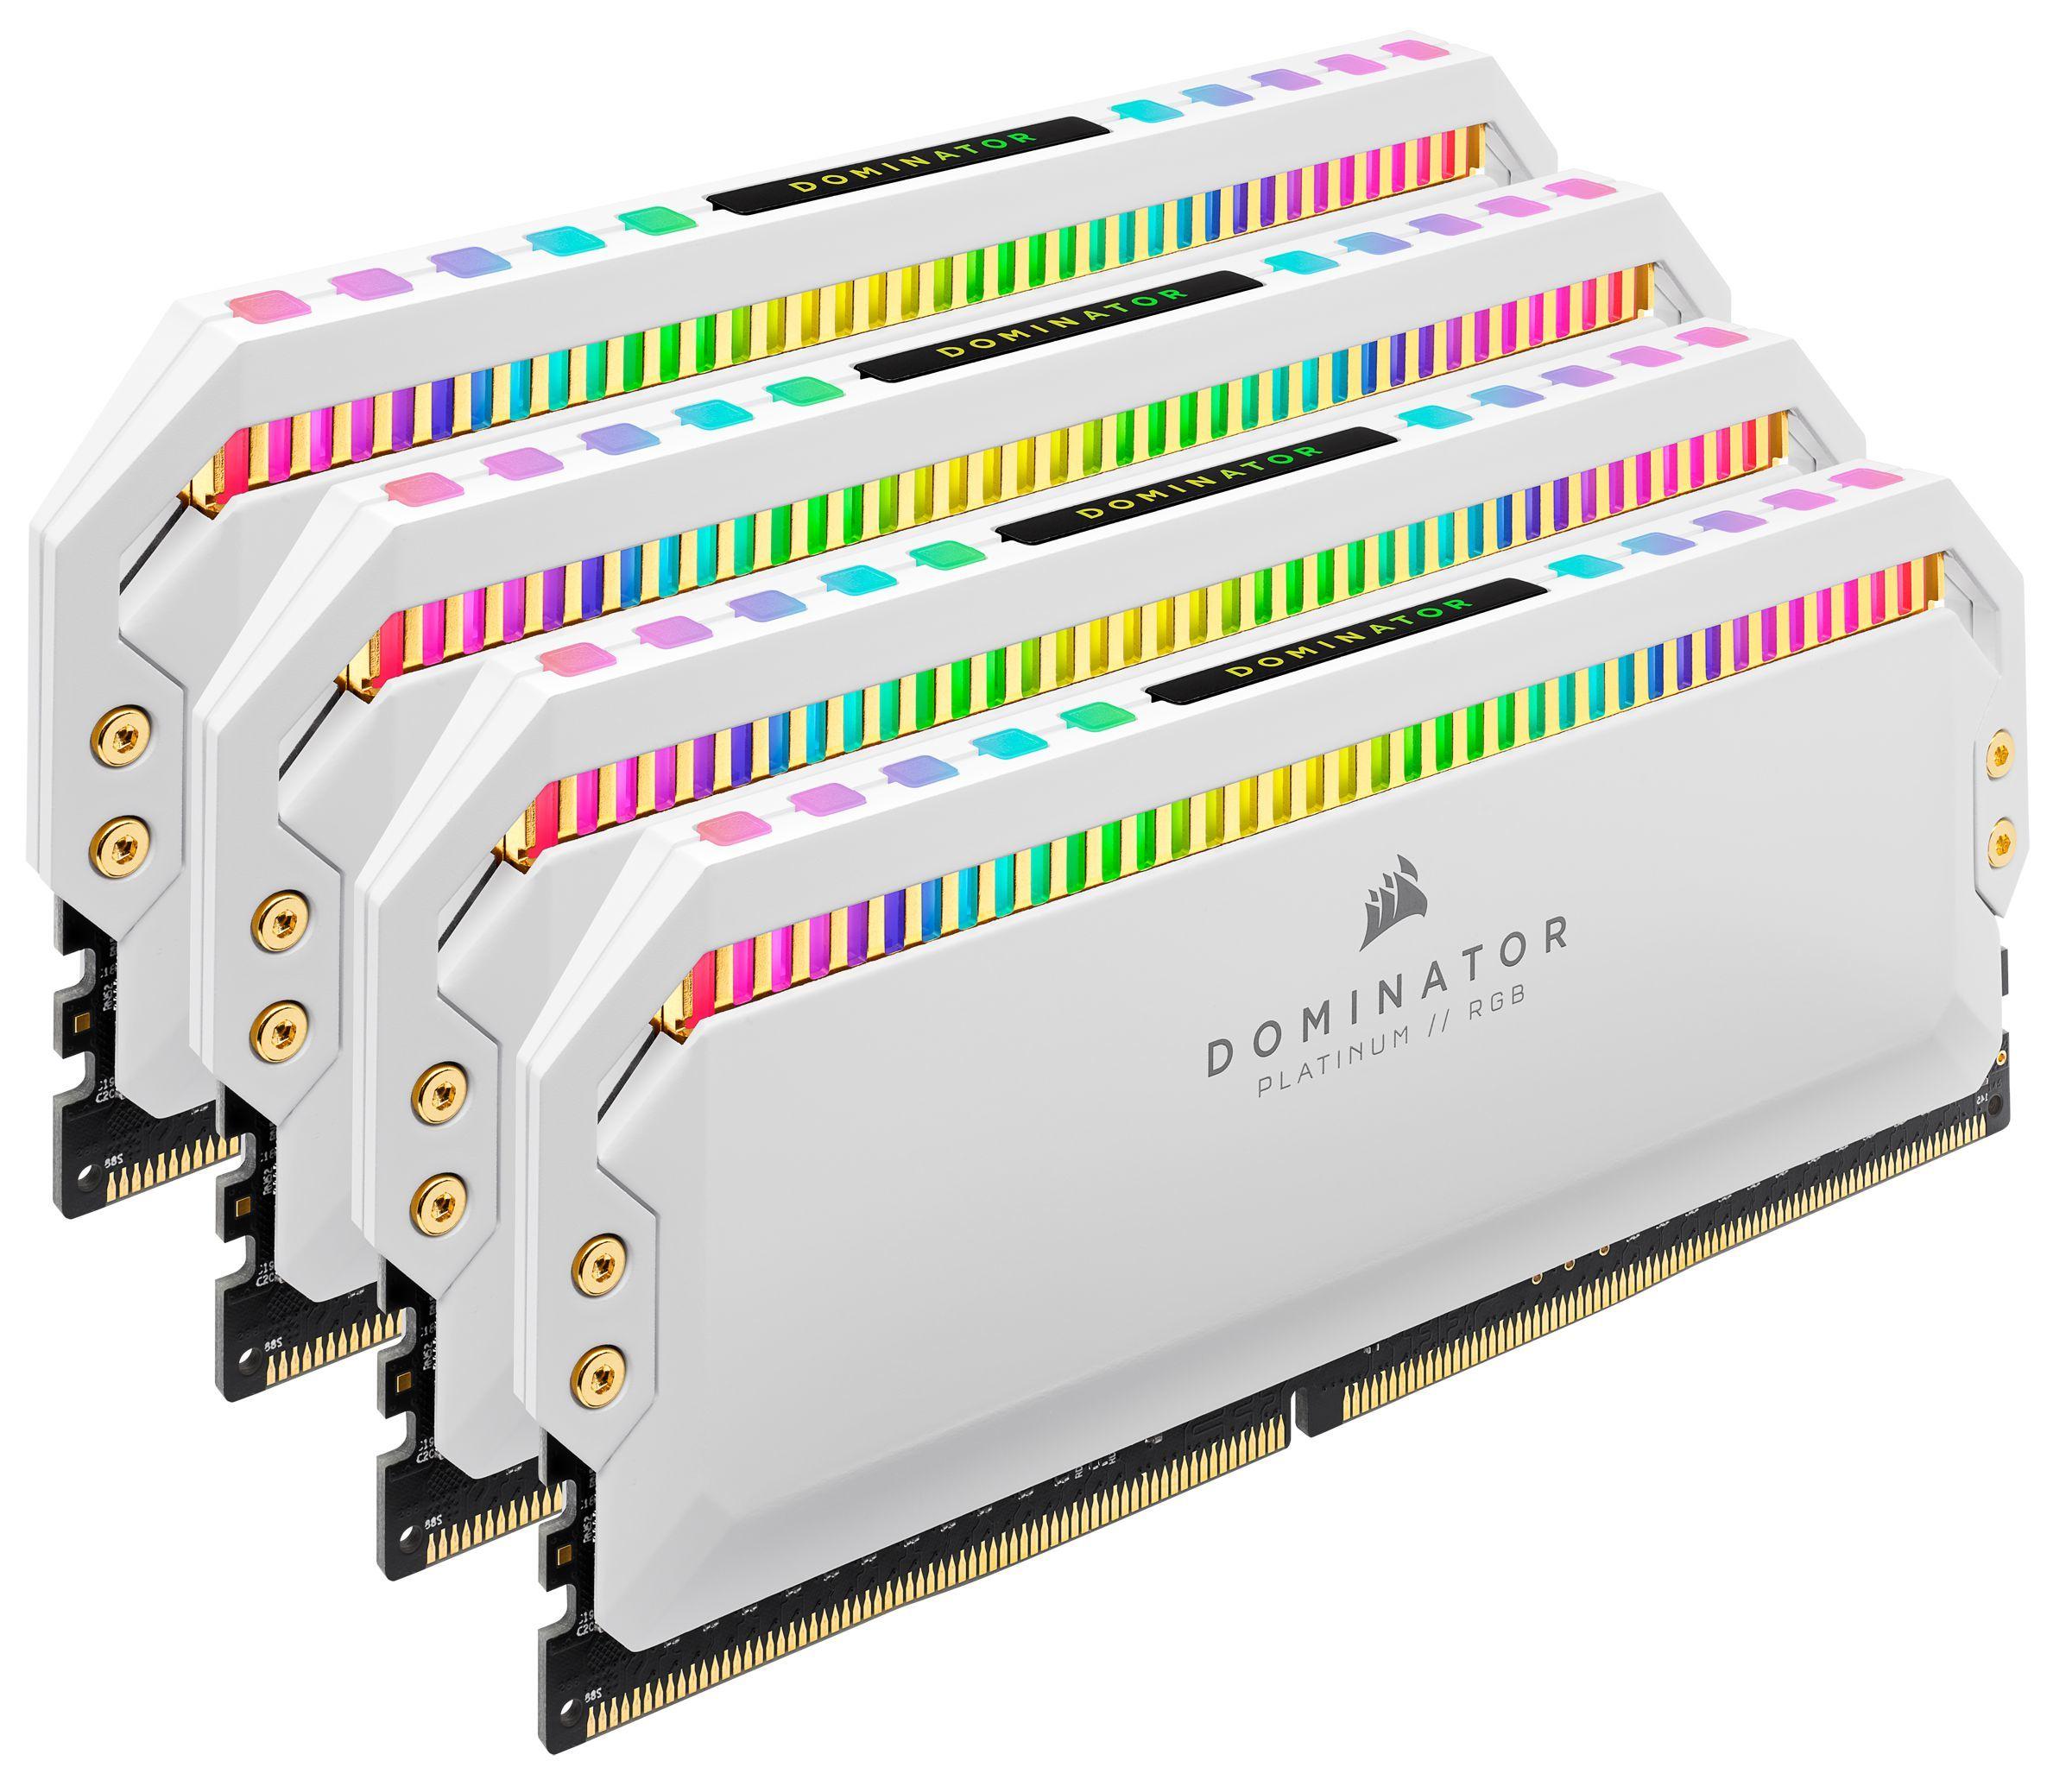 Dominator Platinum - 4 x 8 Go - DDR4 3200 MHz - RGB - Blanc